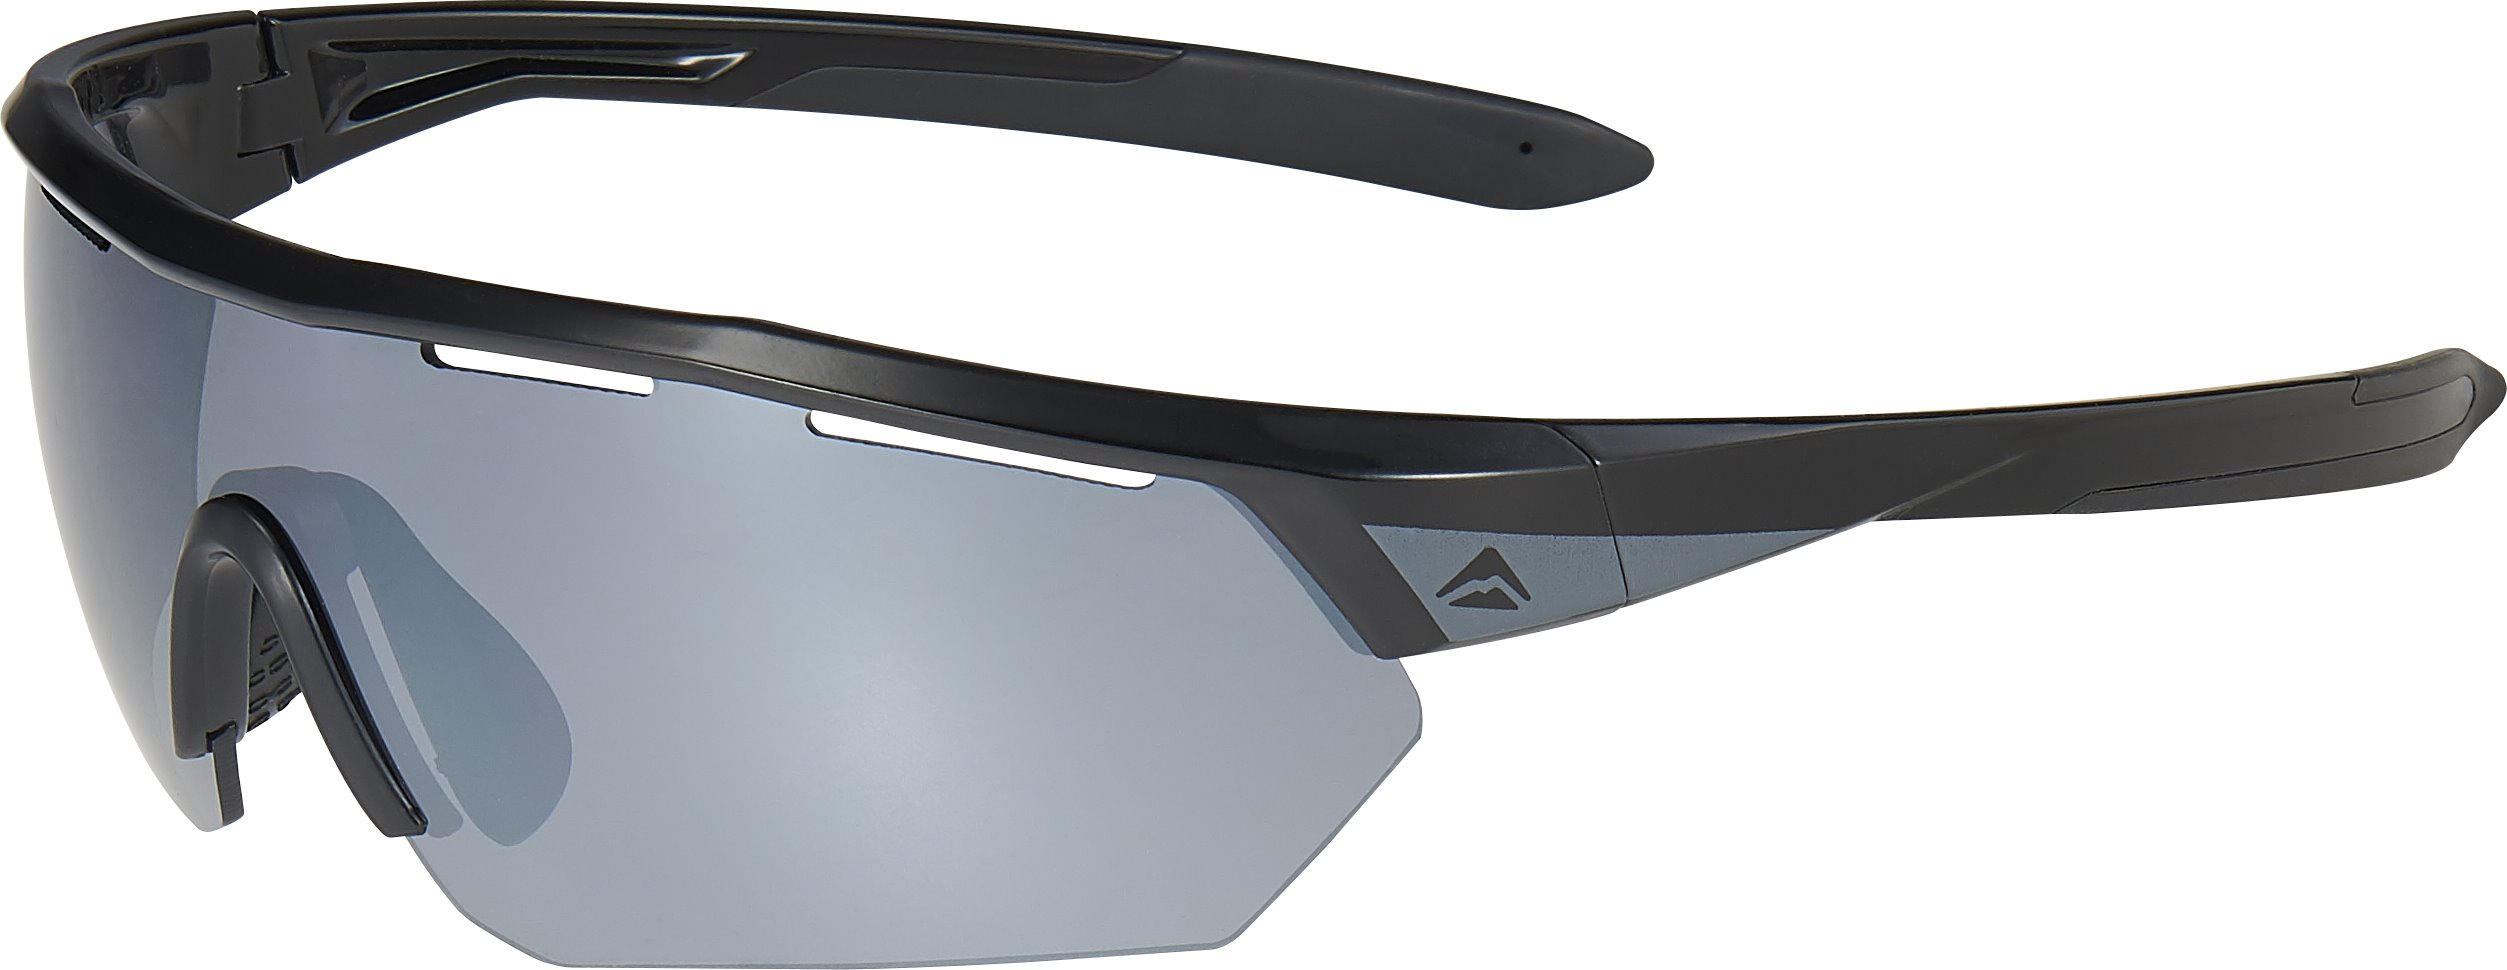 Brýle Sport II černo-šedé